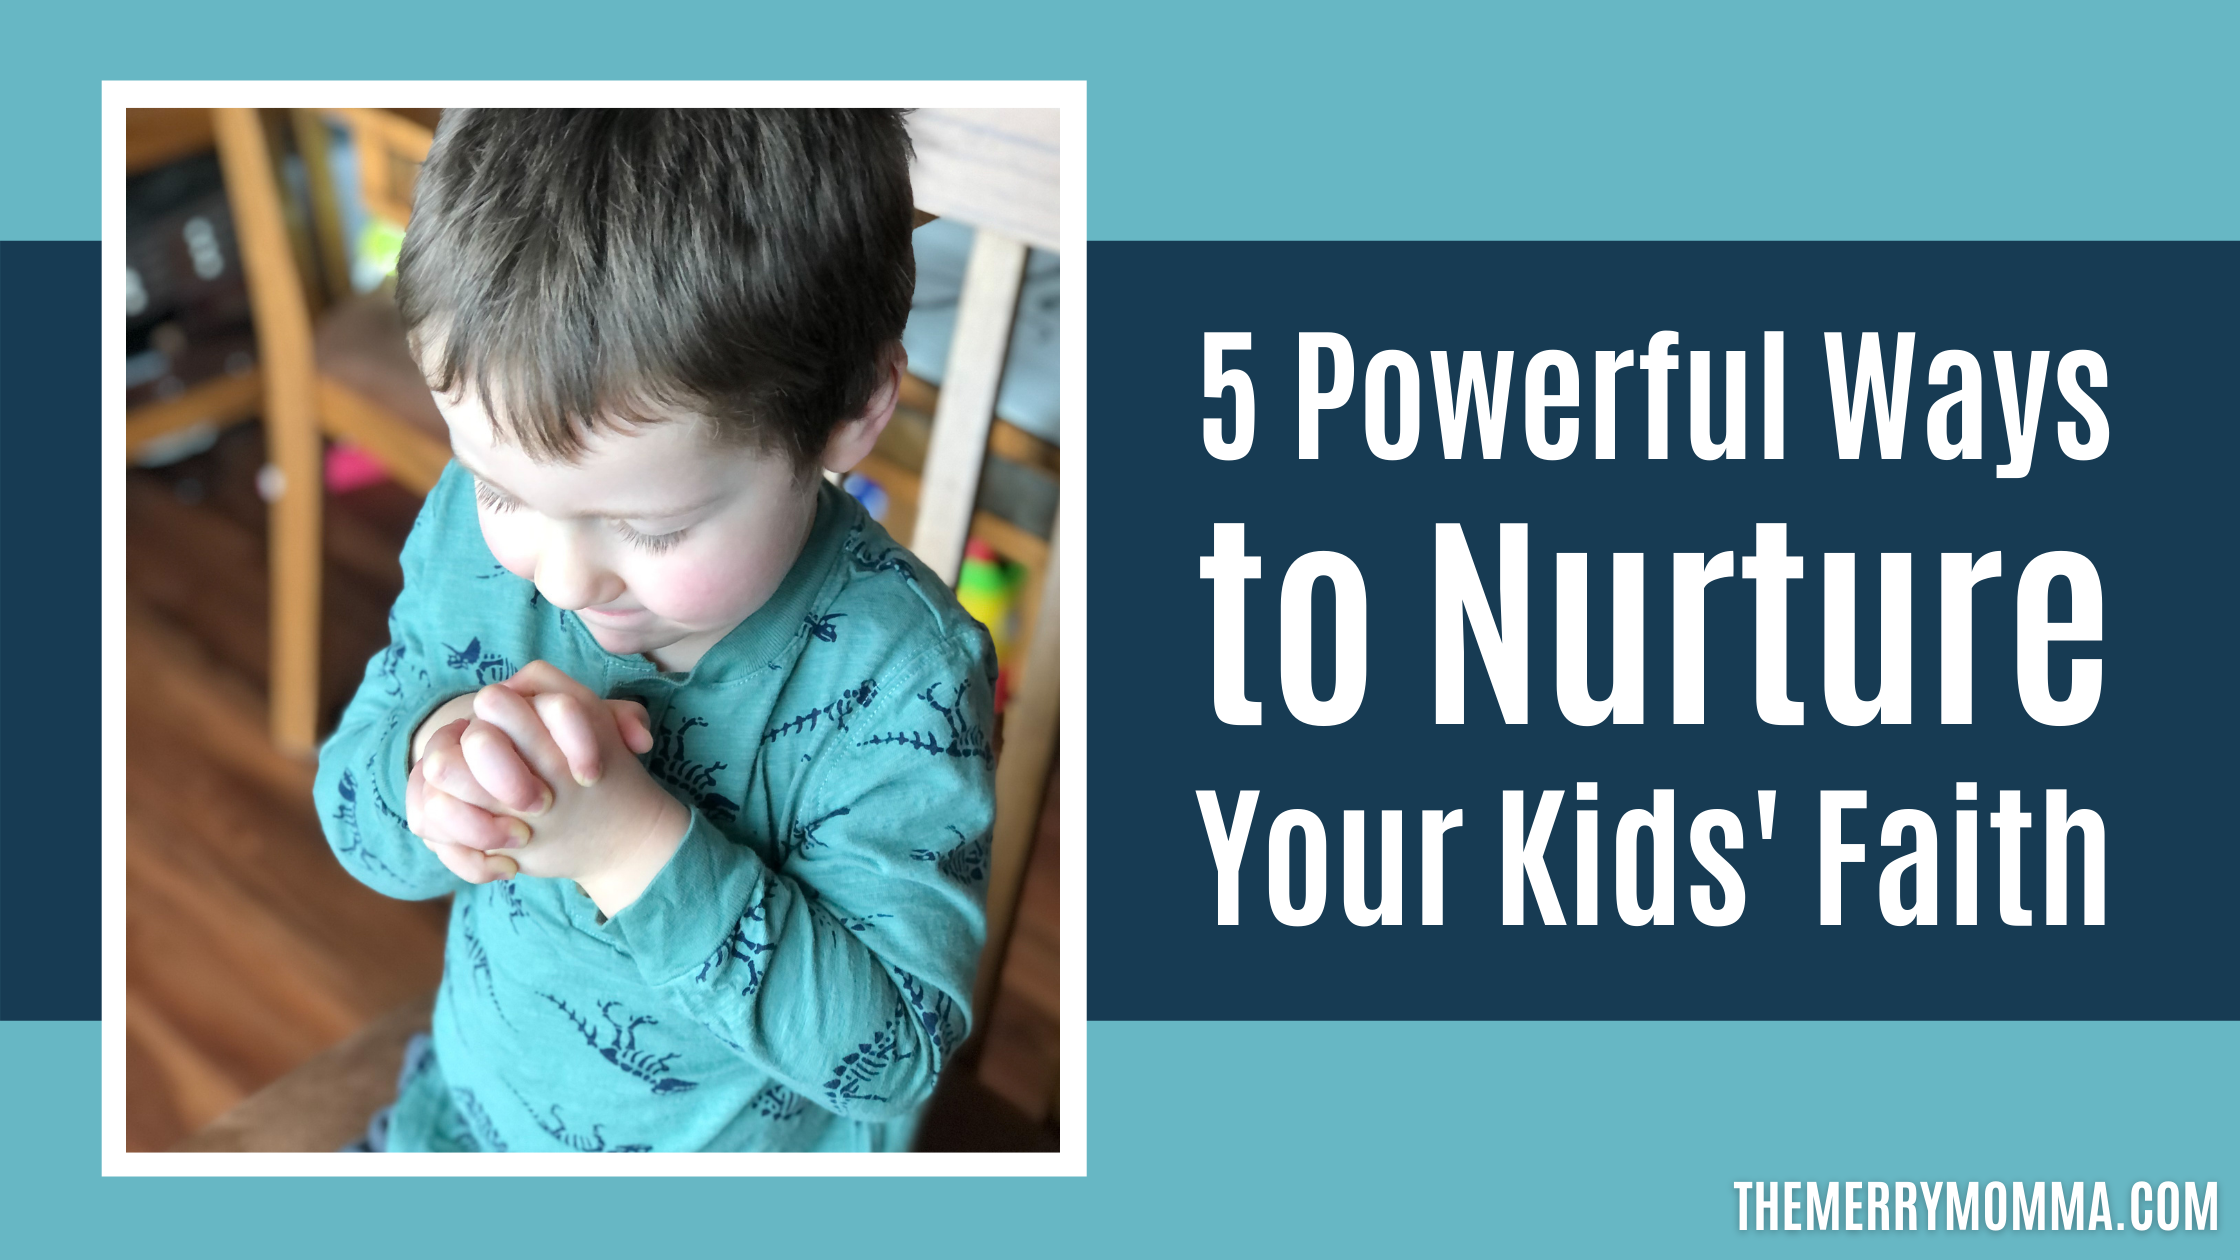 5 Powerful Ways to Nurture Your Kids' Faith | The Merry Momma